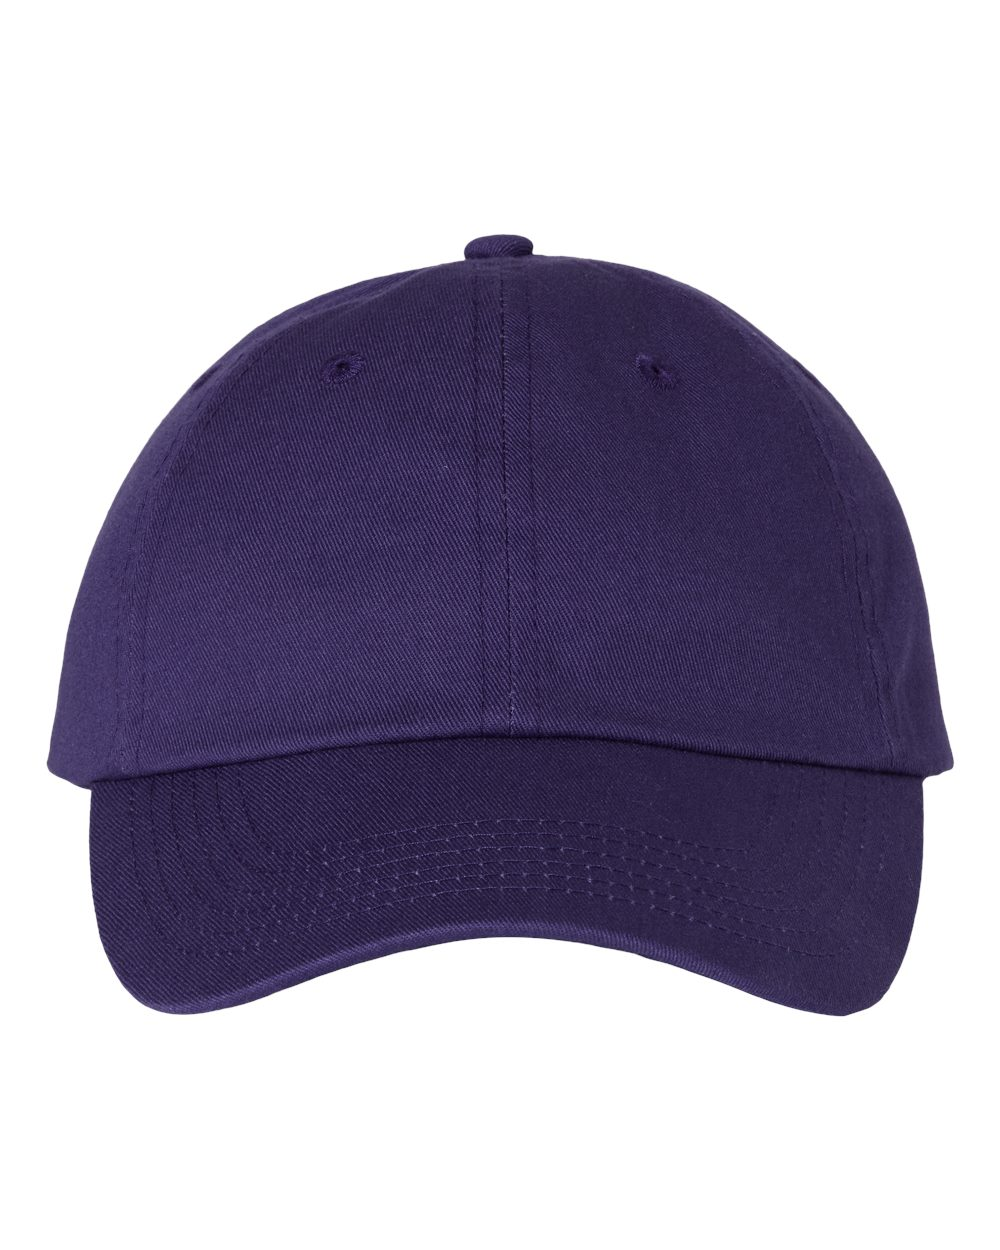 Curved Visor Caps